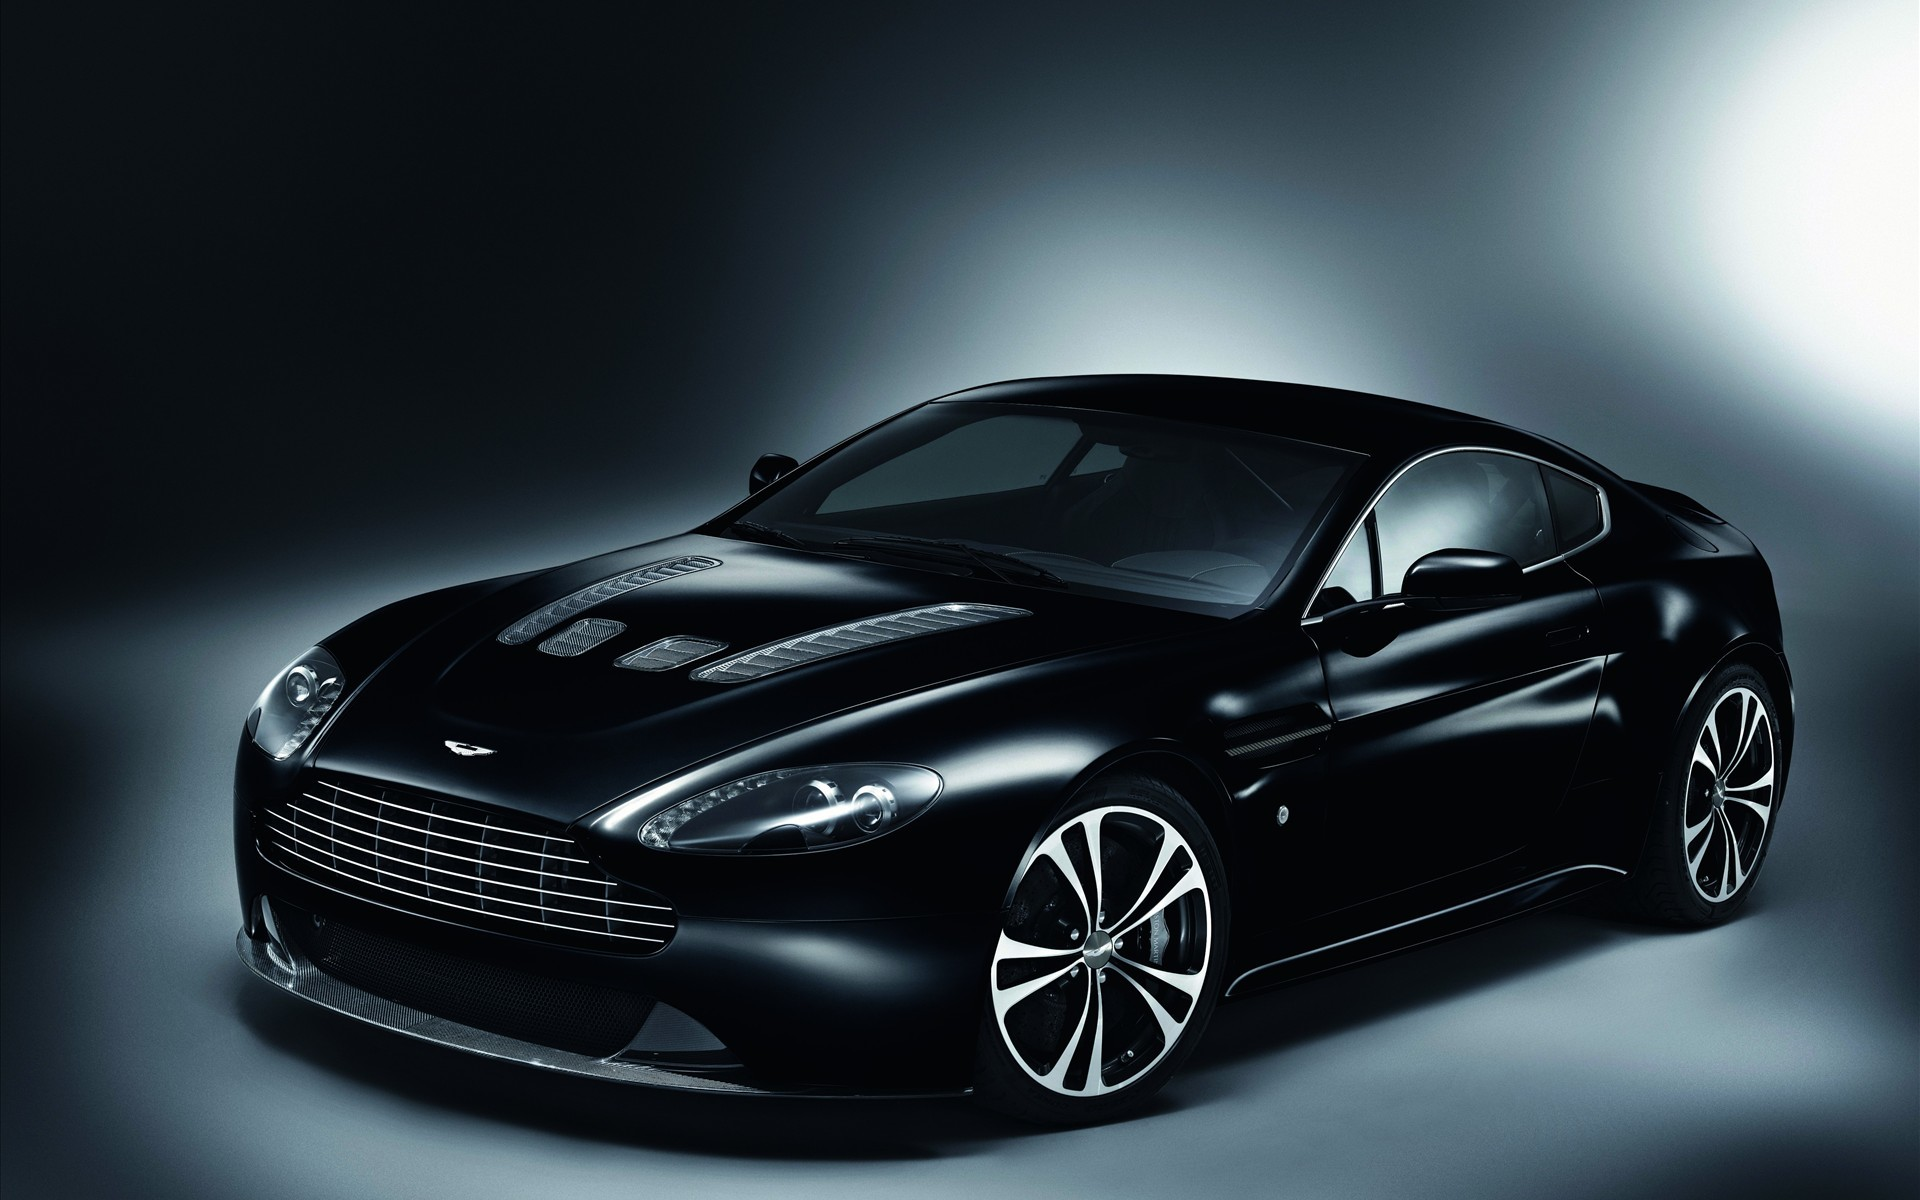 Res: 1920x1200, Aston Martini Carbon Black Charisma